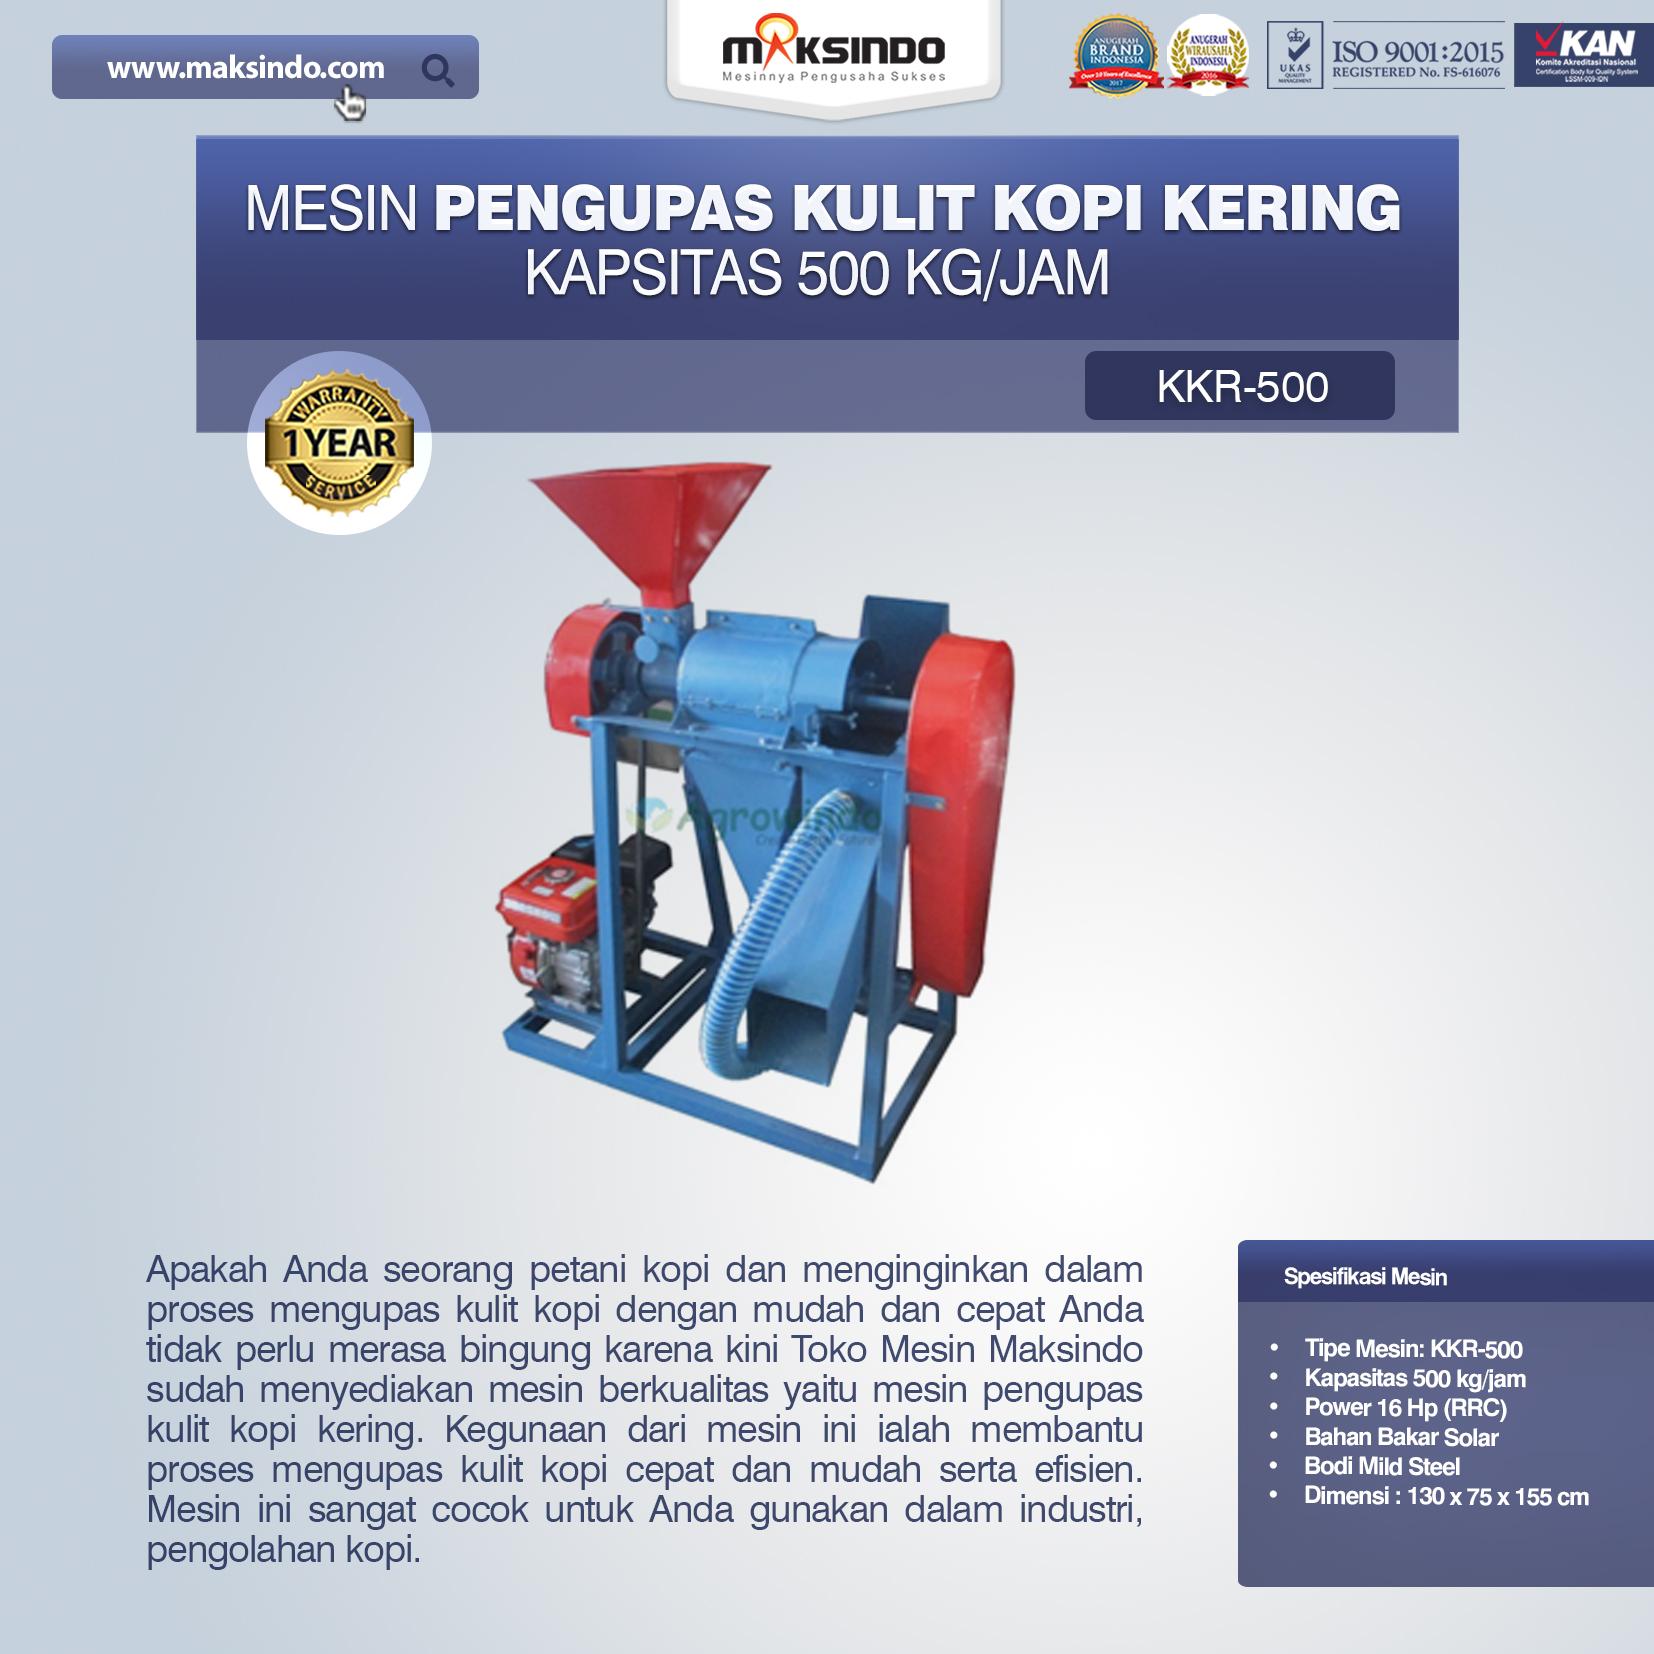 Jual Mesin Pengupas Kulit Kopi Kering di Palembang